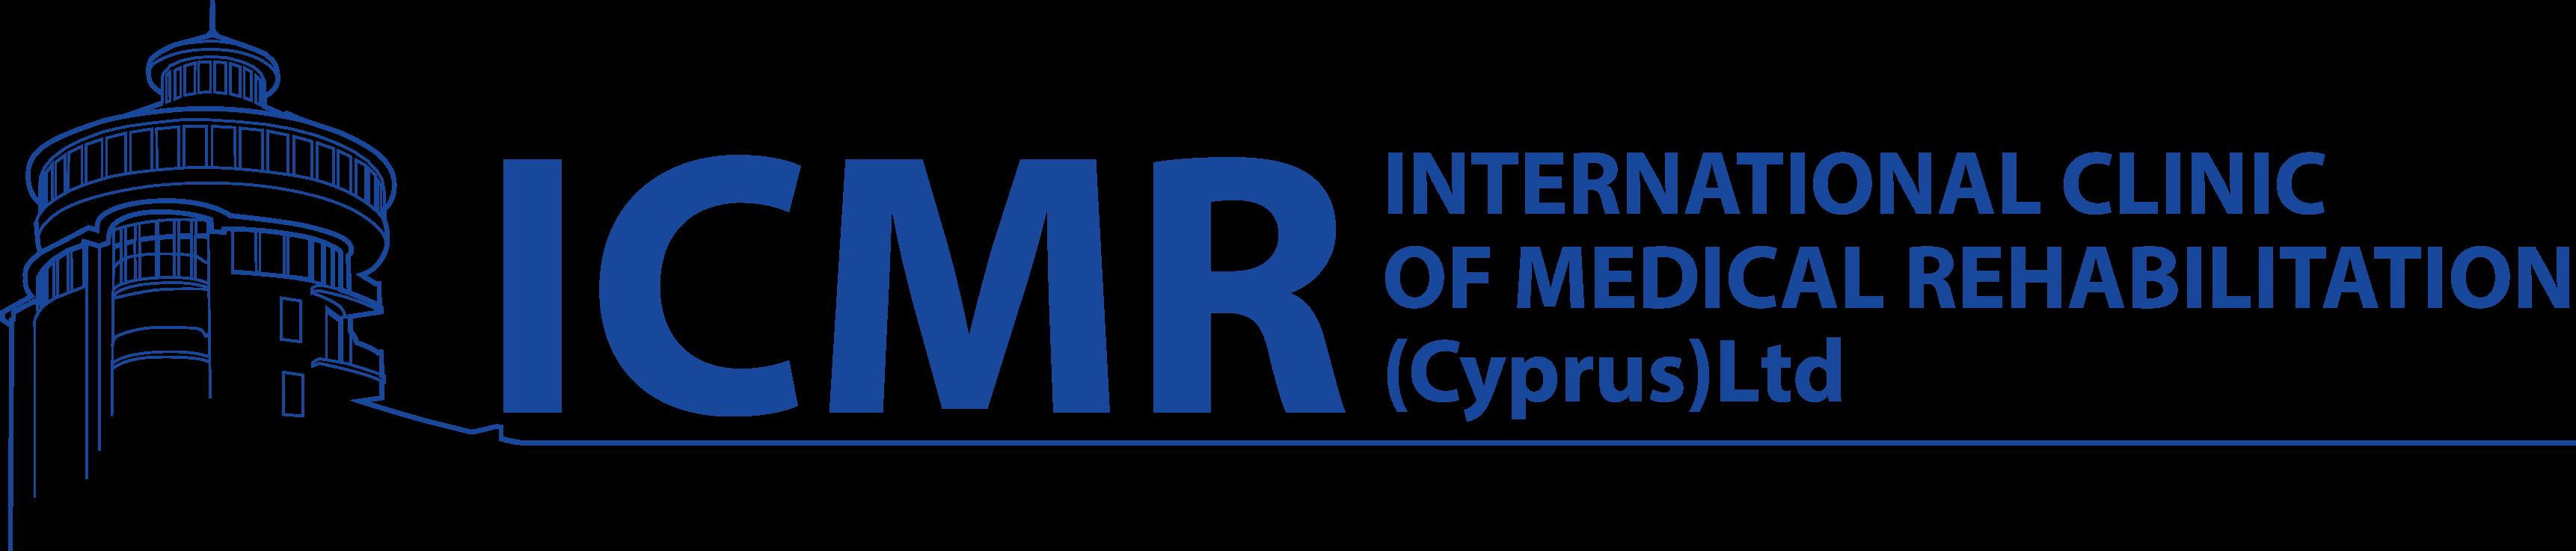 ICMR logotype